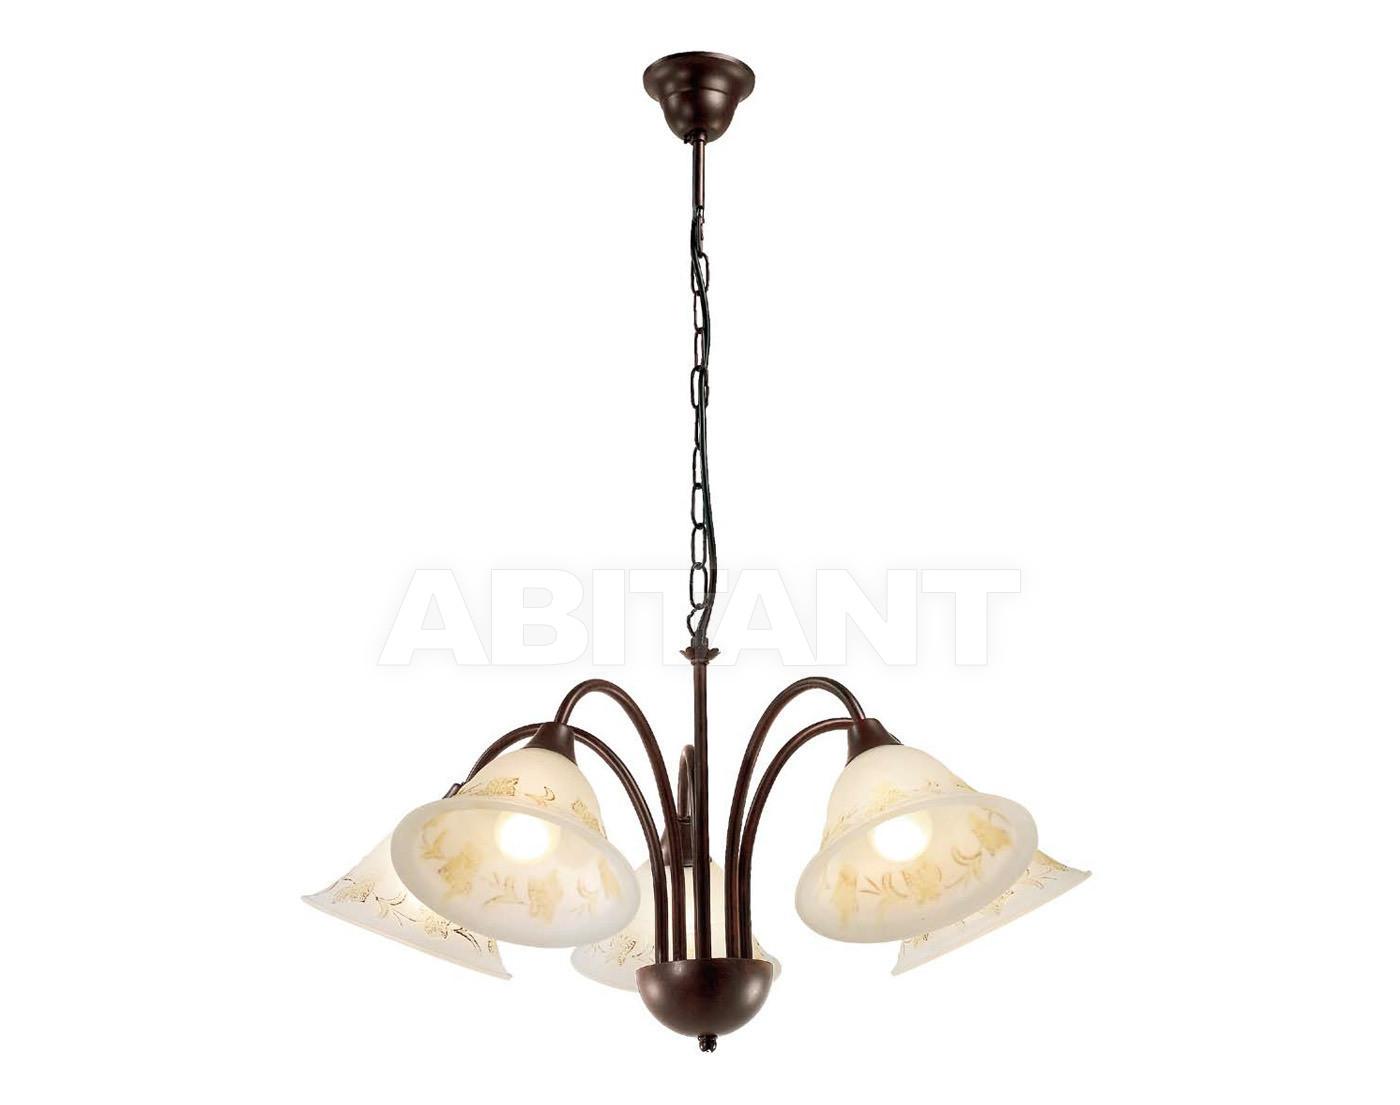 Купить Люстра Orchidea Leonardo Luce Italia Interno Decorativo 2305/S-5